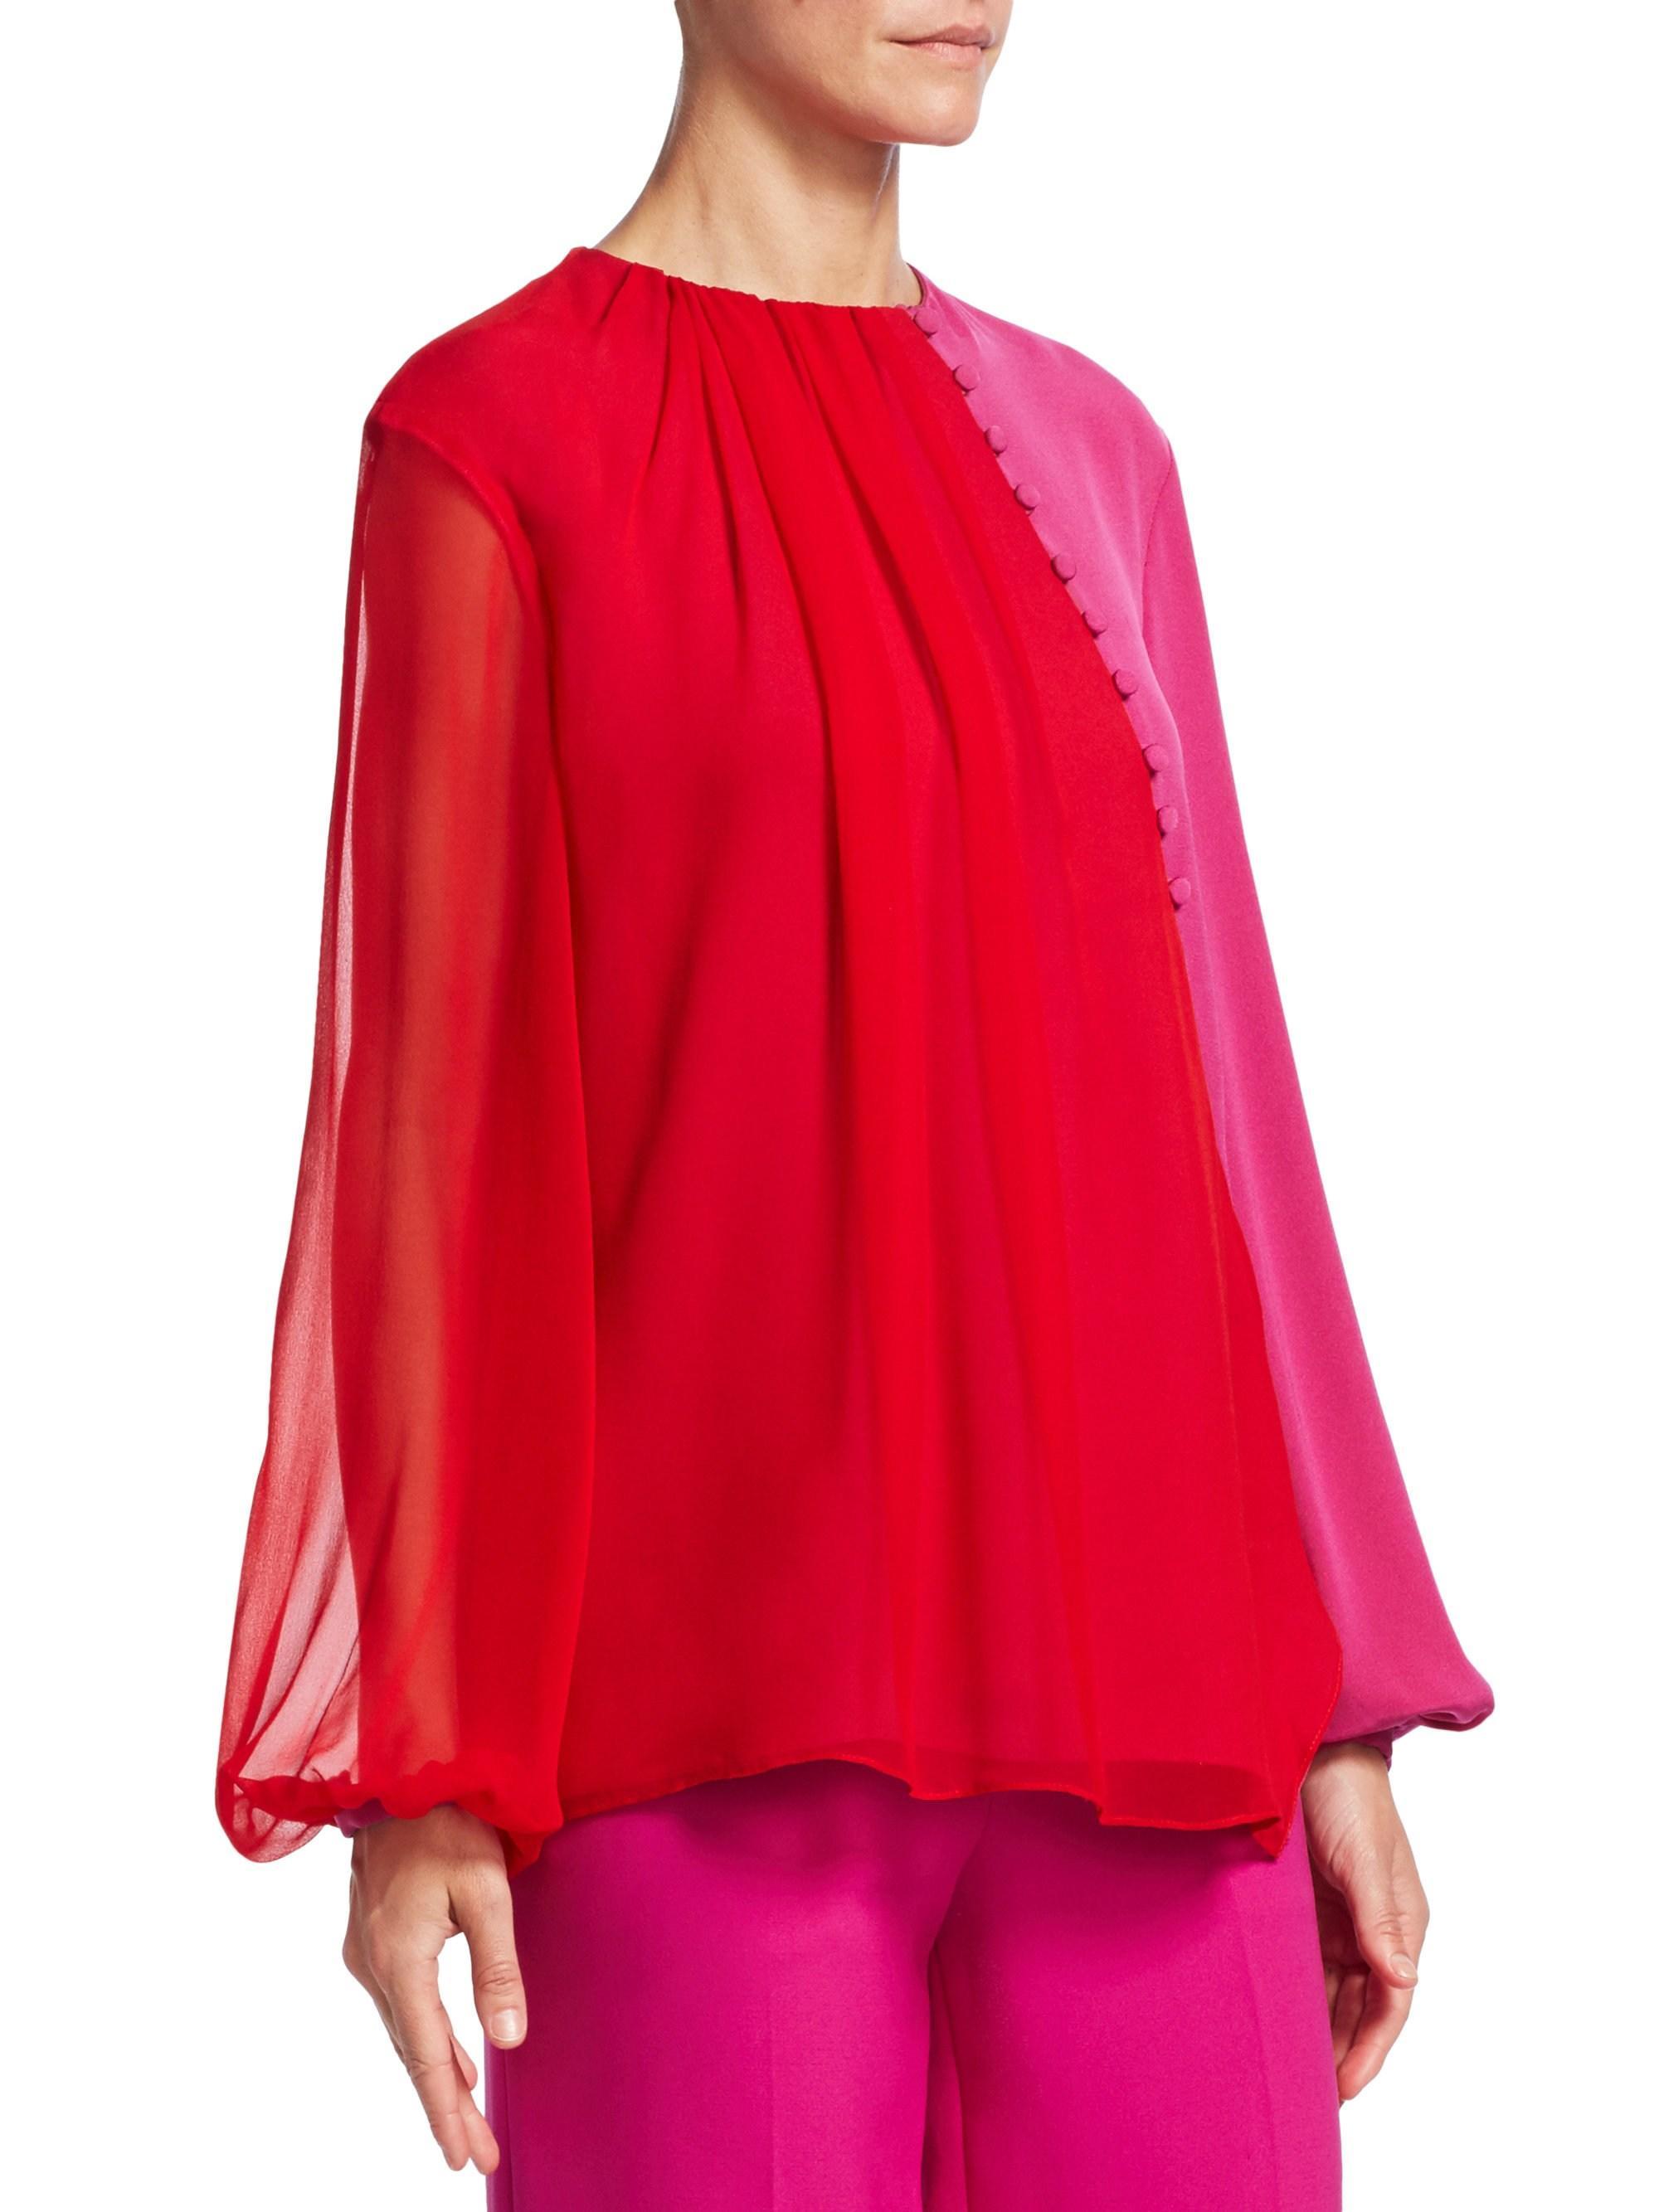 48e30df78da7 prabal-gurung-red-raspberry-Womens-Colorblock-Chiffon-Blouse-Red -Raspberry-Size-2.jpeg